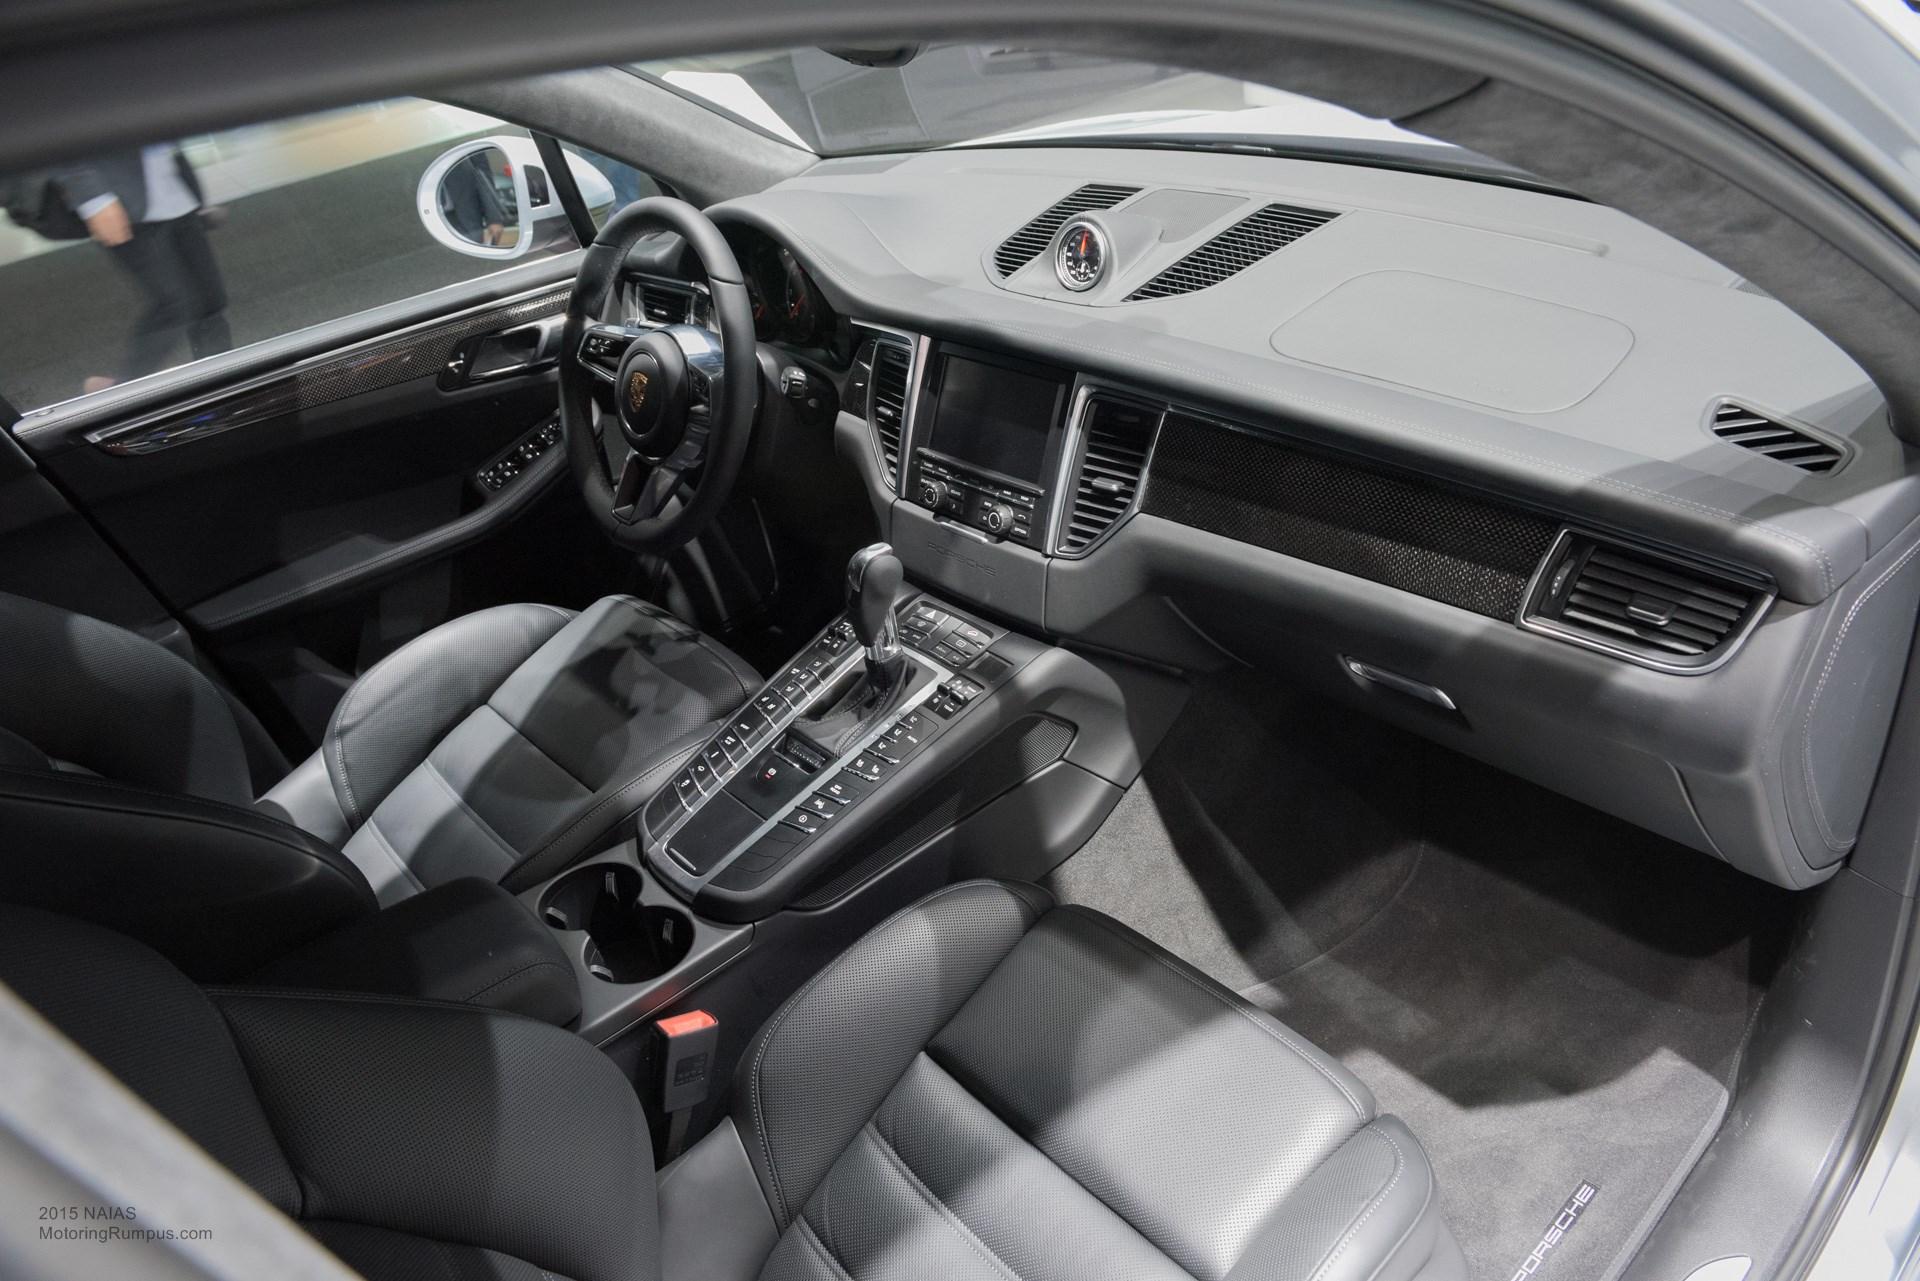 2015 Naias Porsche Macan Turbo Interior Motoring Rumpus